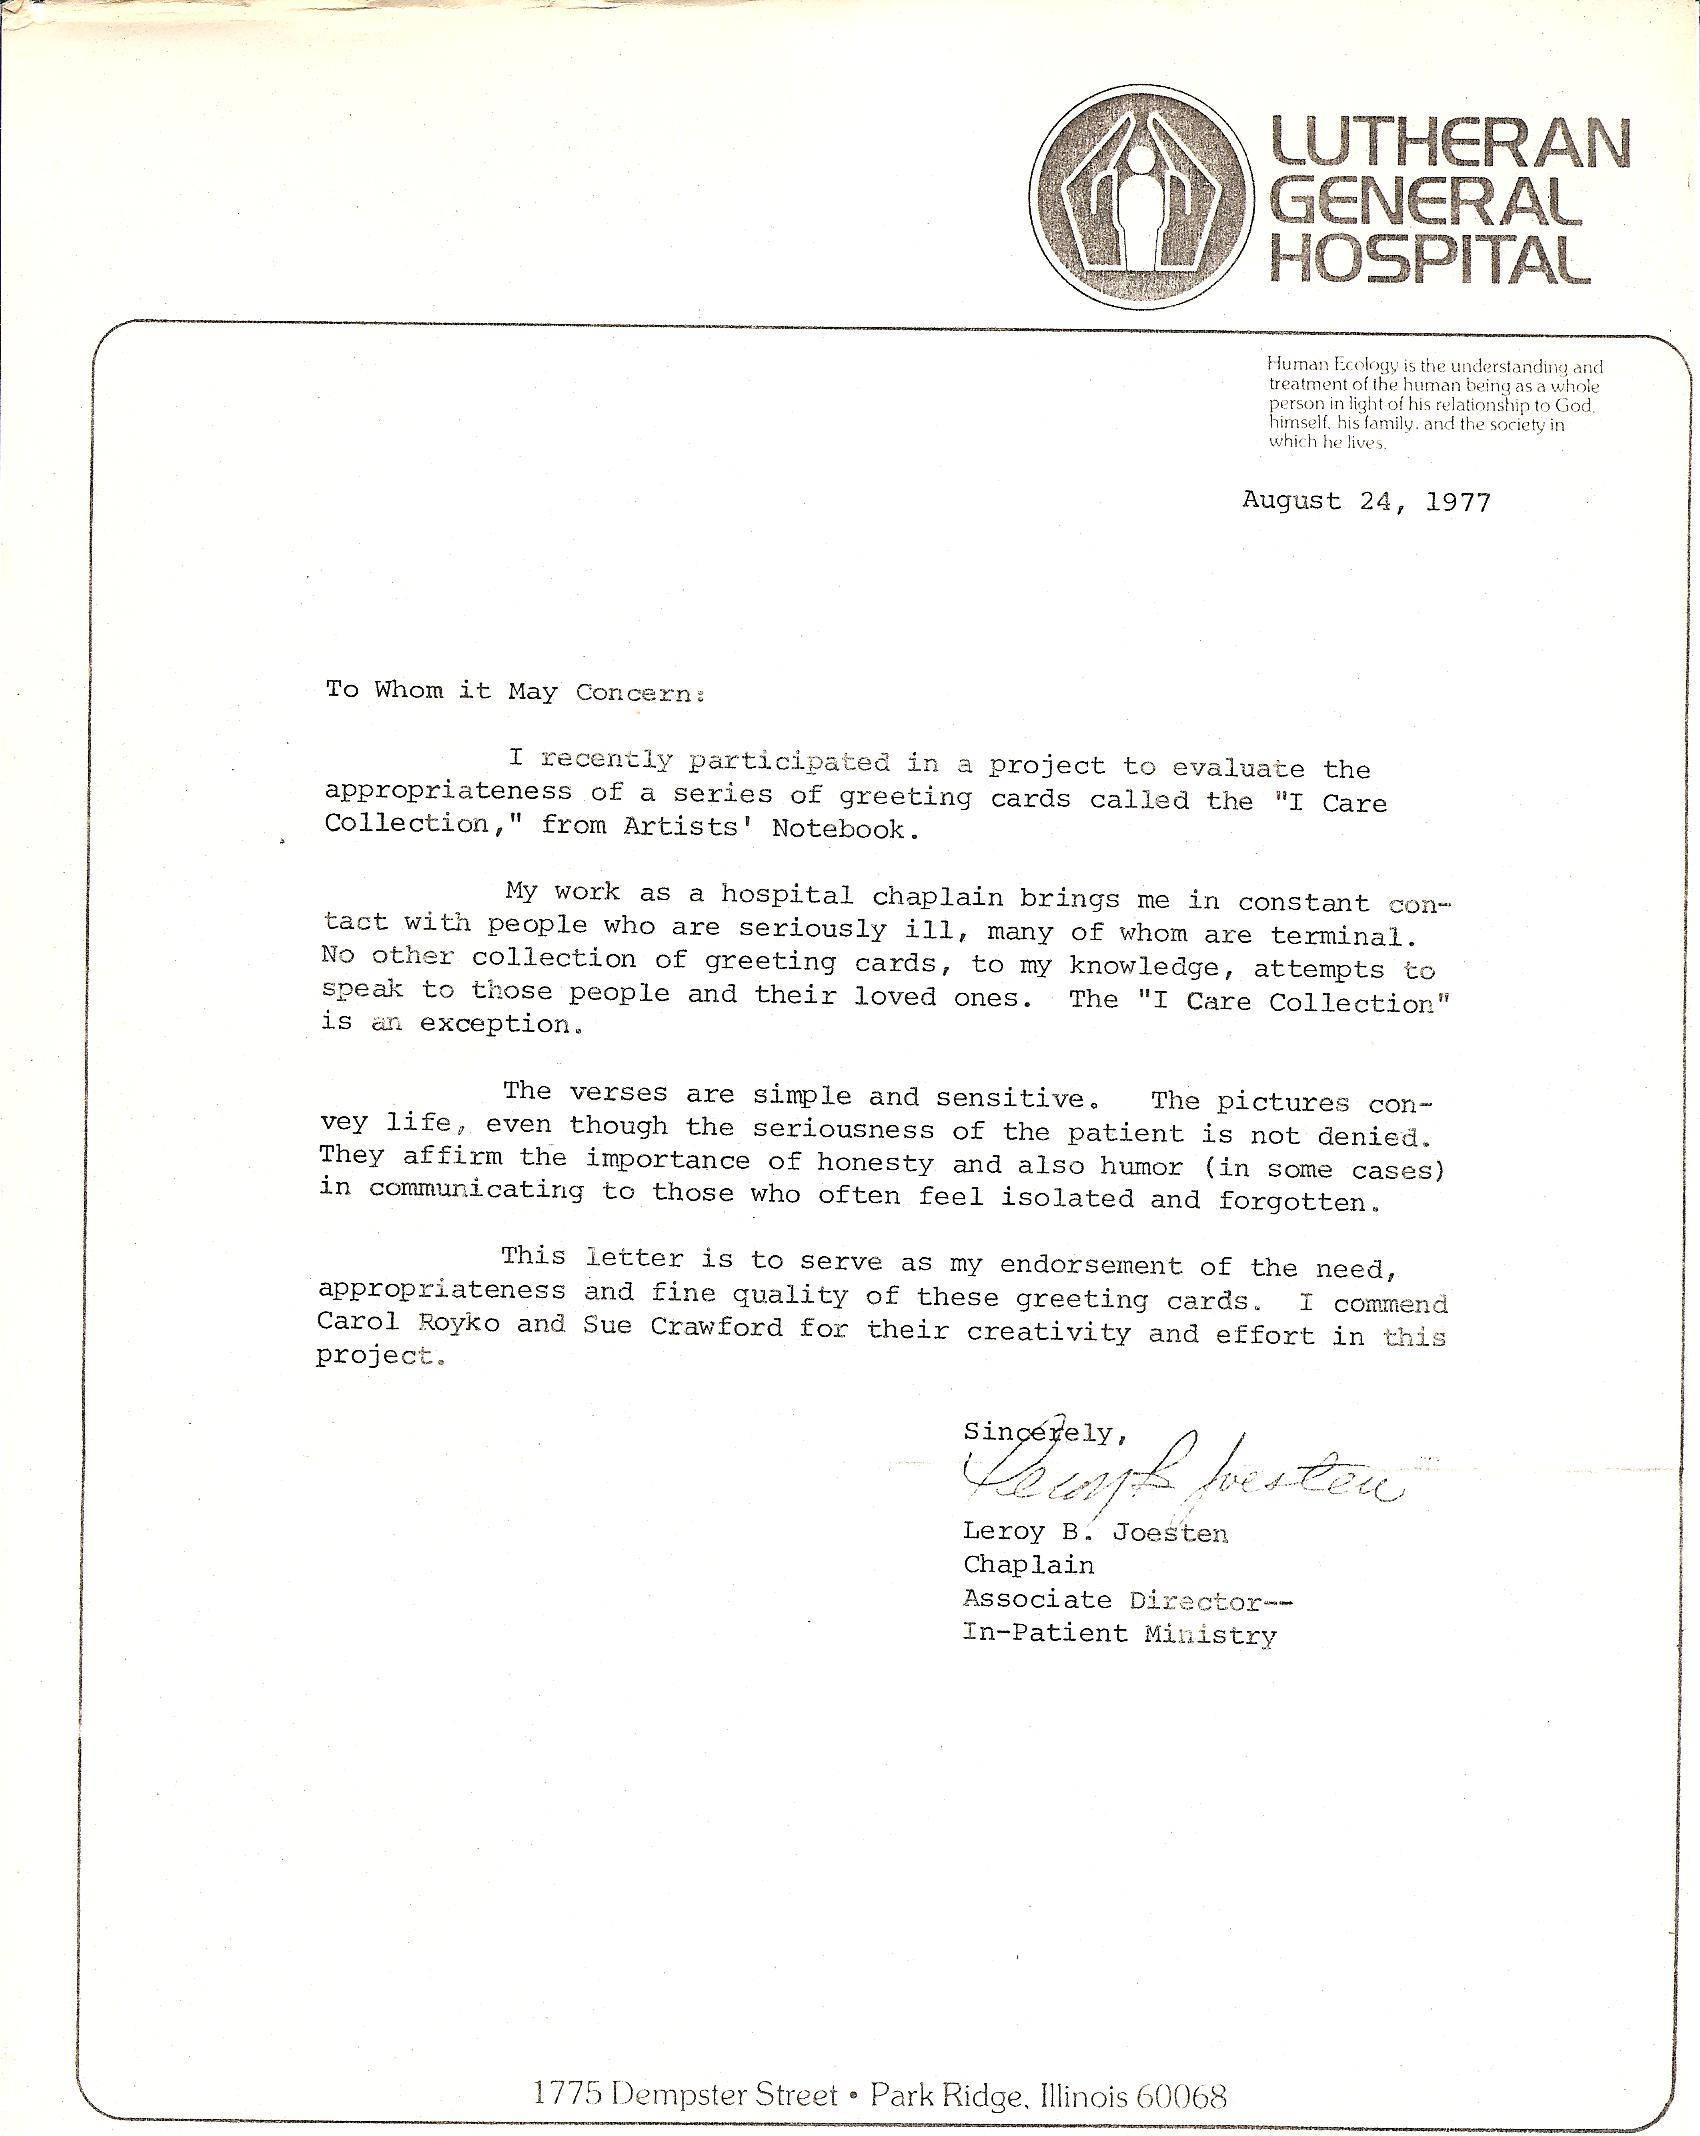 Lutheran General Hospital, Park Ridge, Illinois